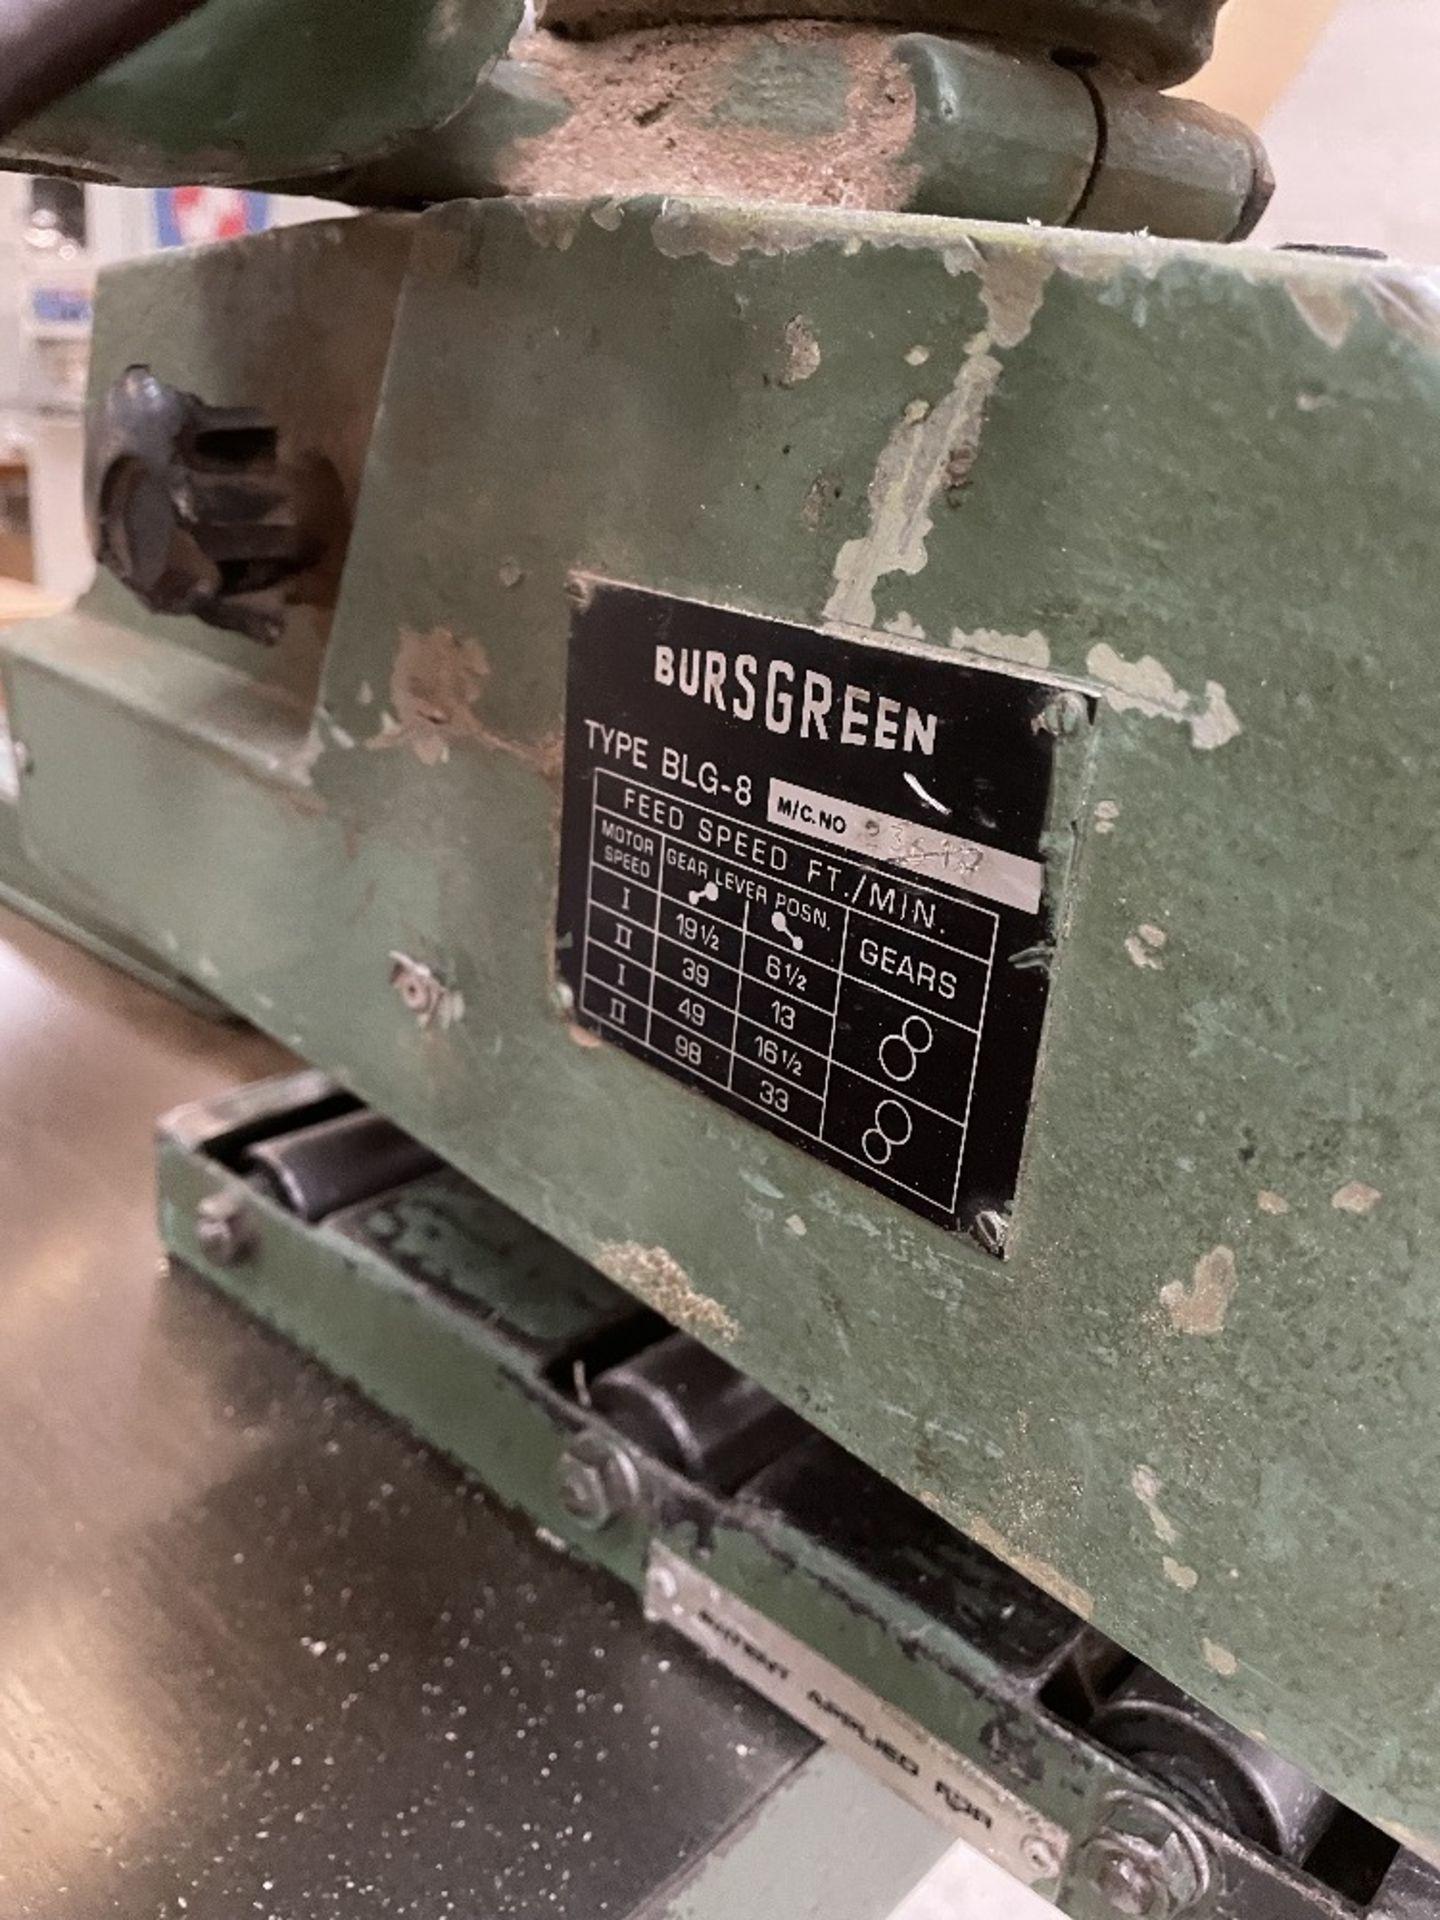 Wadkin Bursgreen Vertical Bandsaw w/ Power Feed - Image 8 of 9